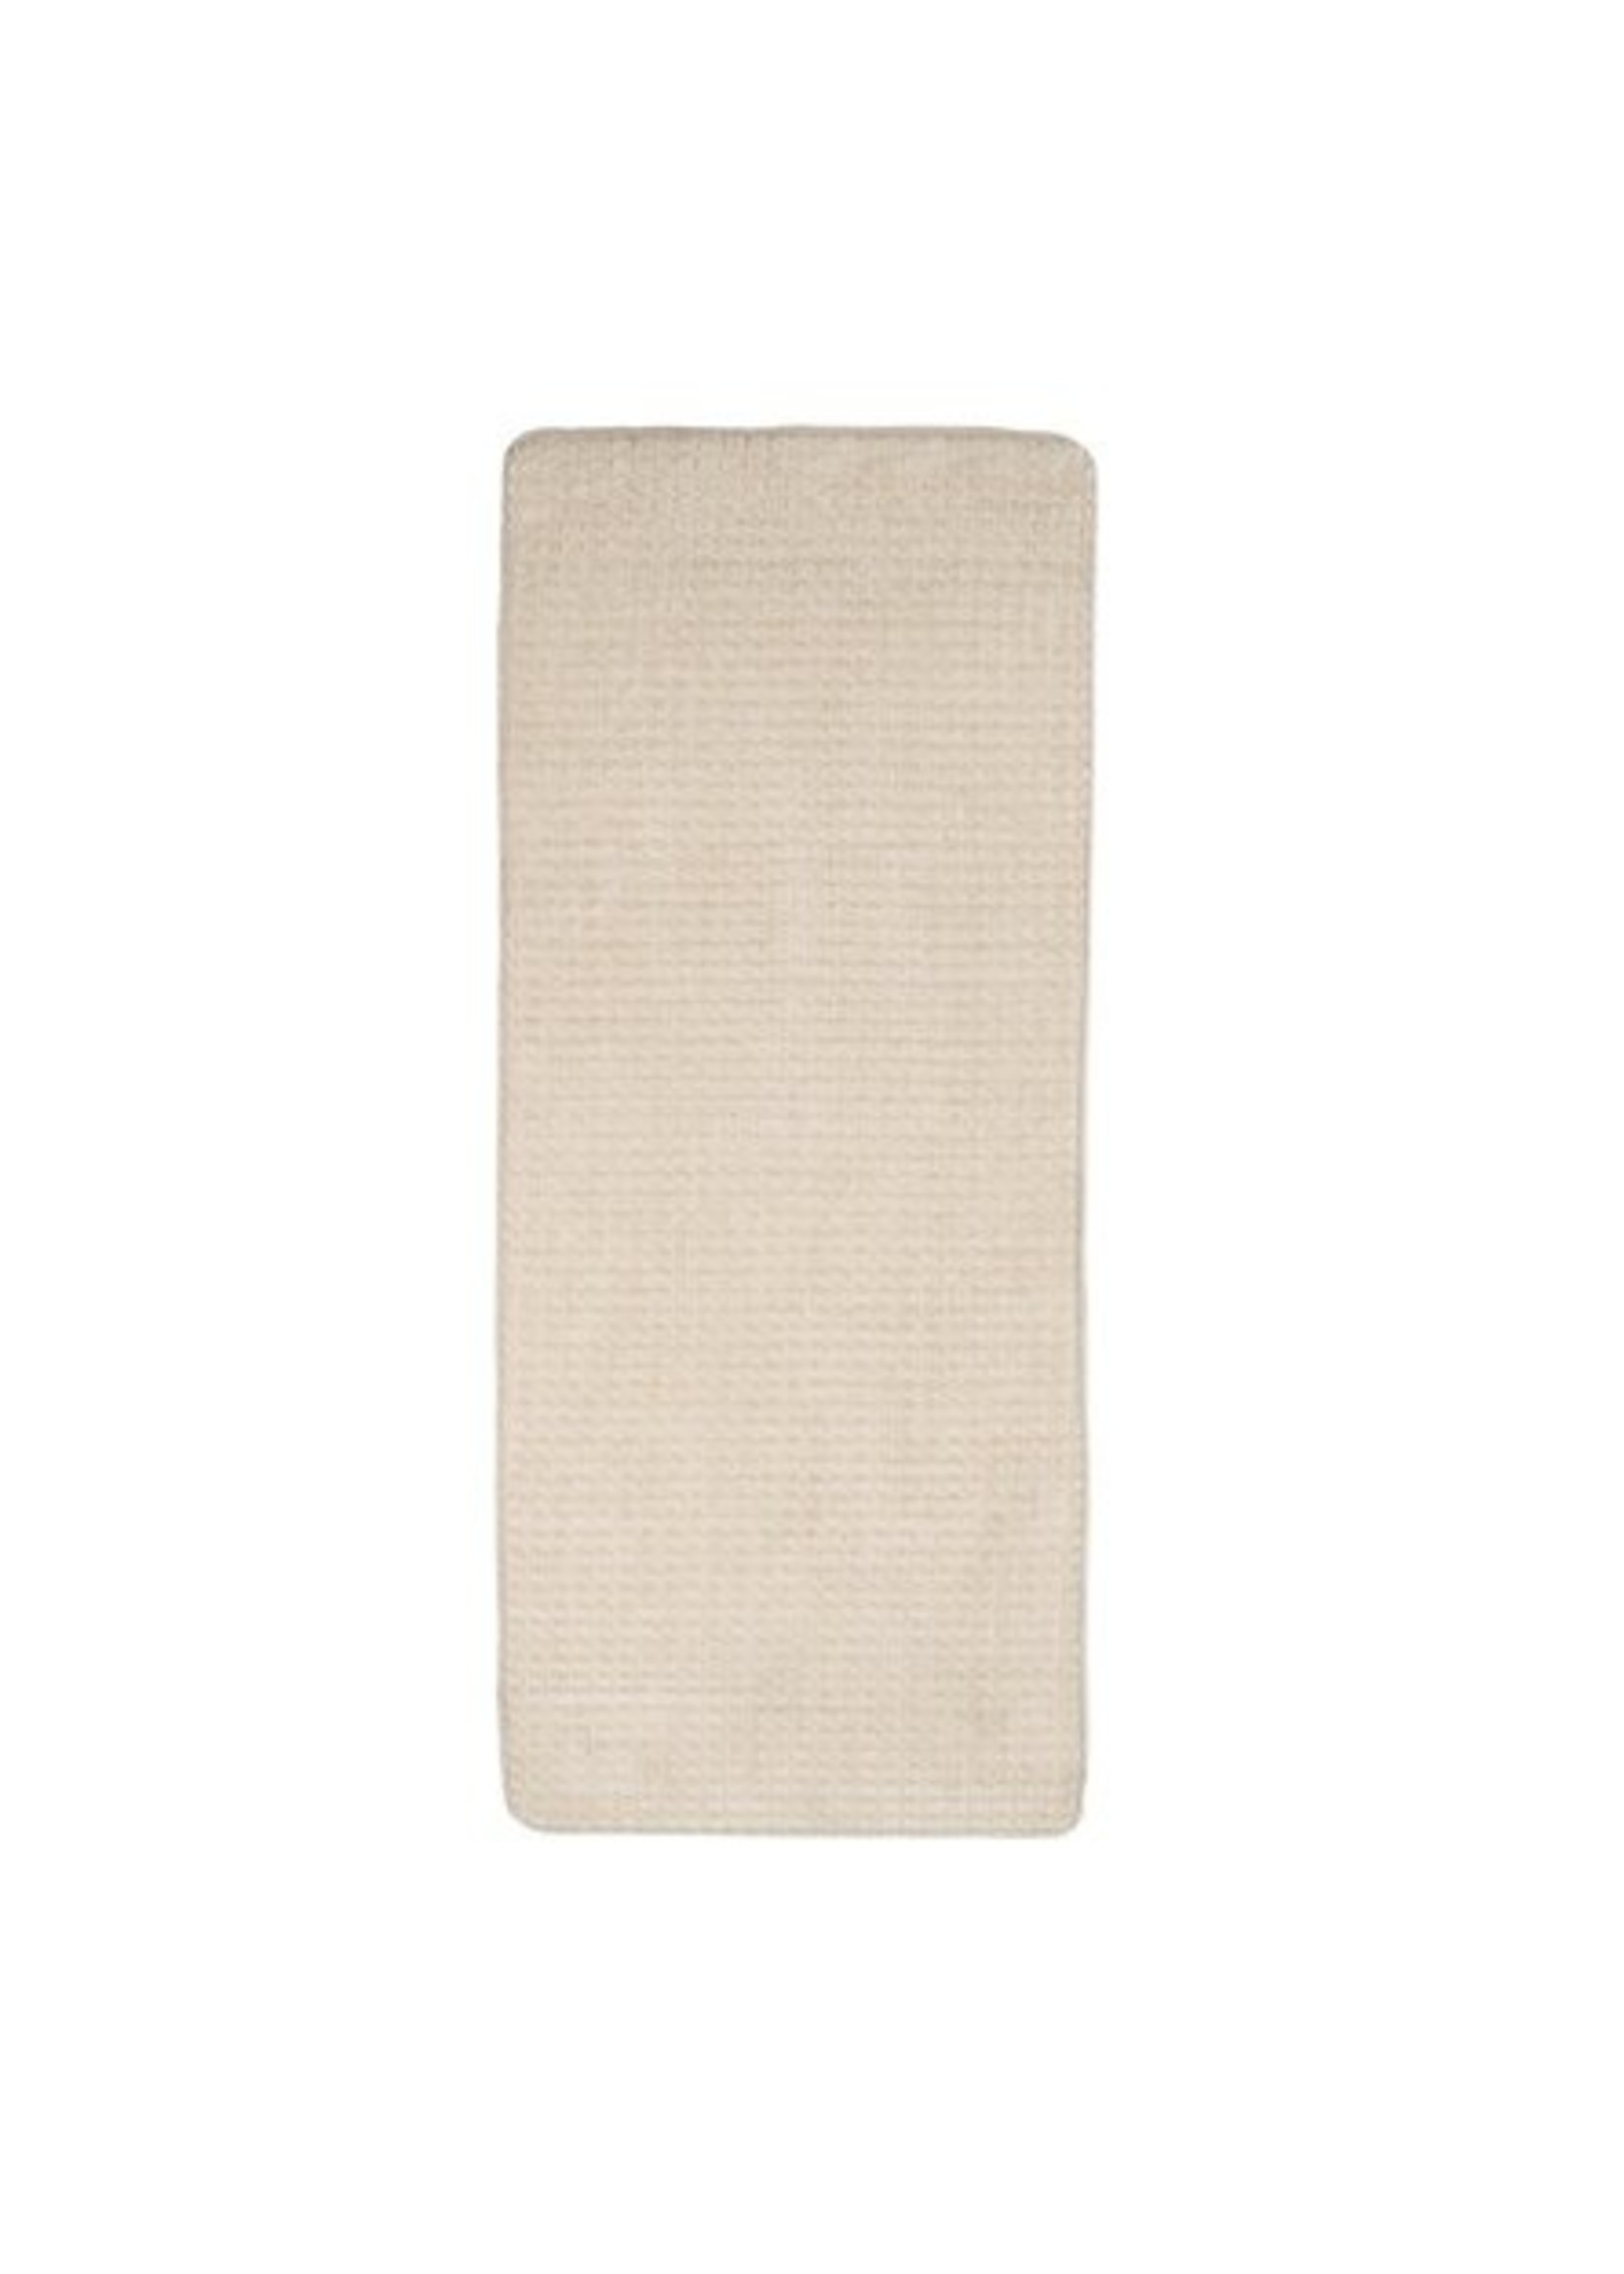 *Jacquard Fleece Long Multiple Memory Foam Non-Slip Bath Rug